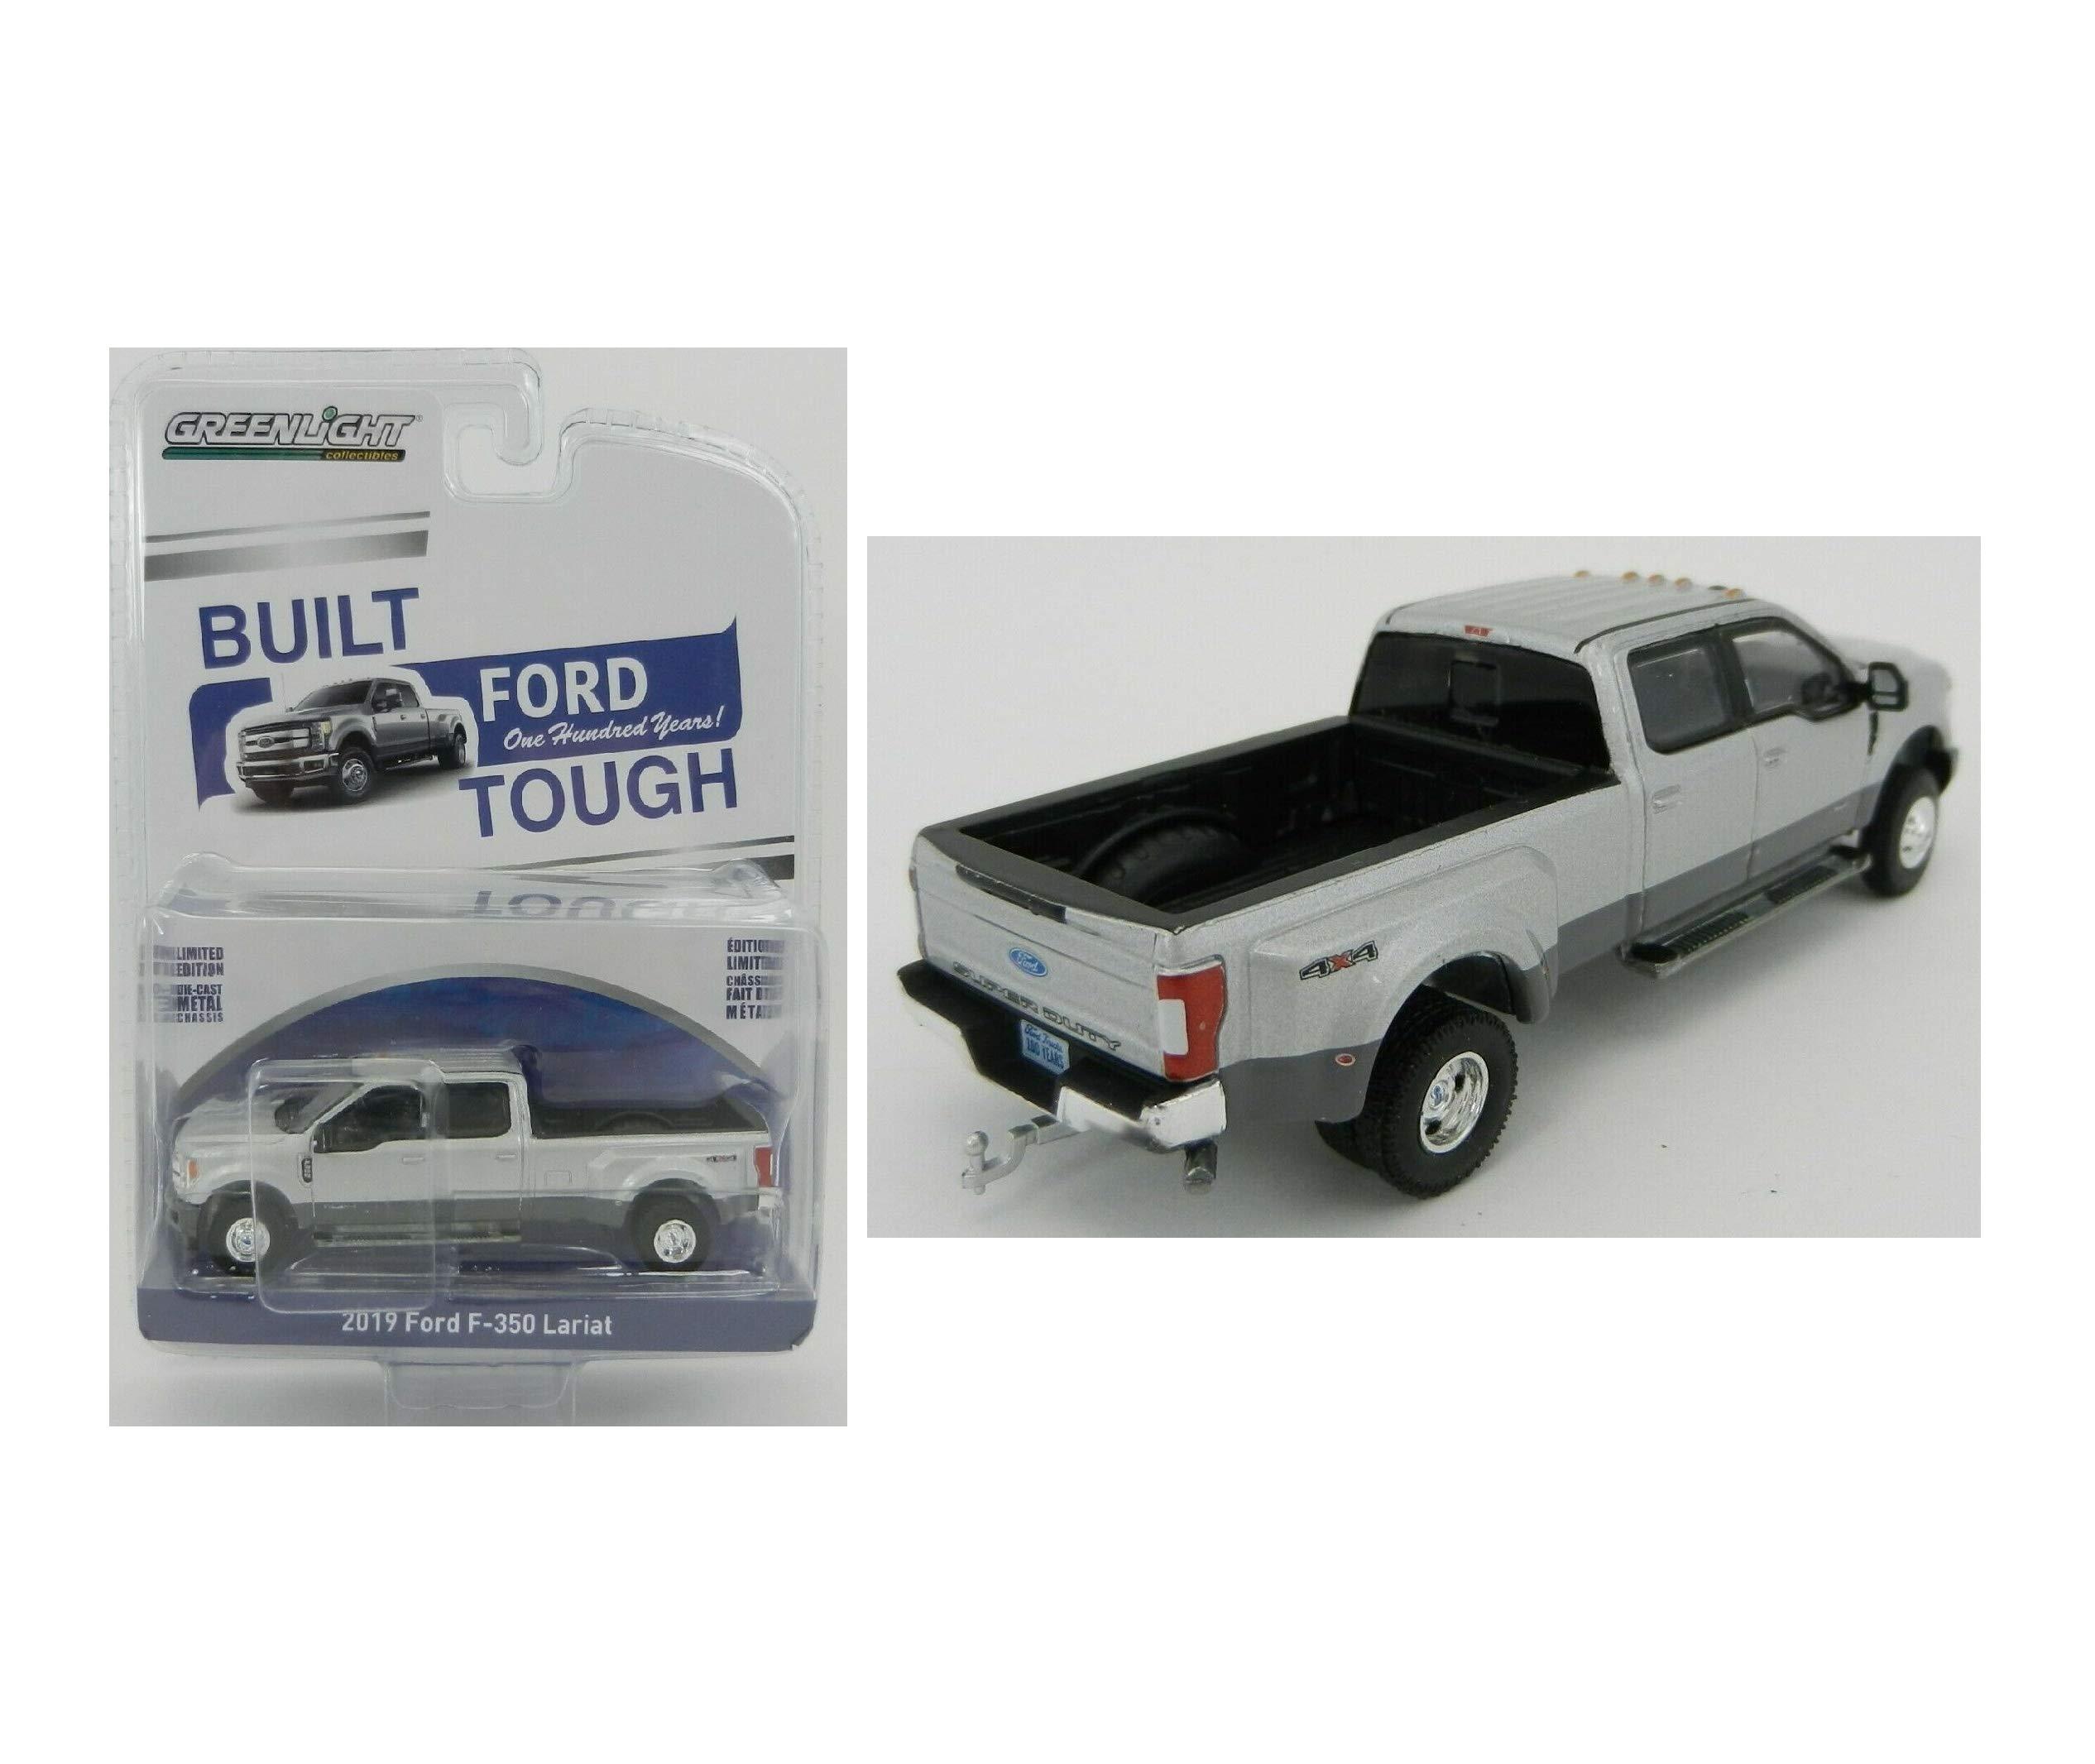 2019 ford f-350 lariat-dually Big Truck ** GreenLight Anniversary 1:64 nuevo